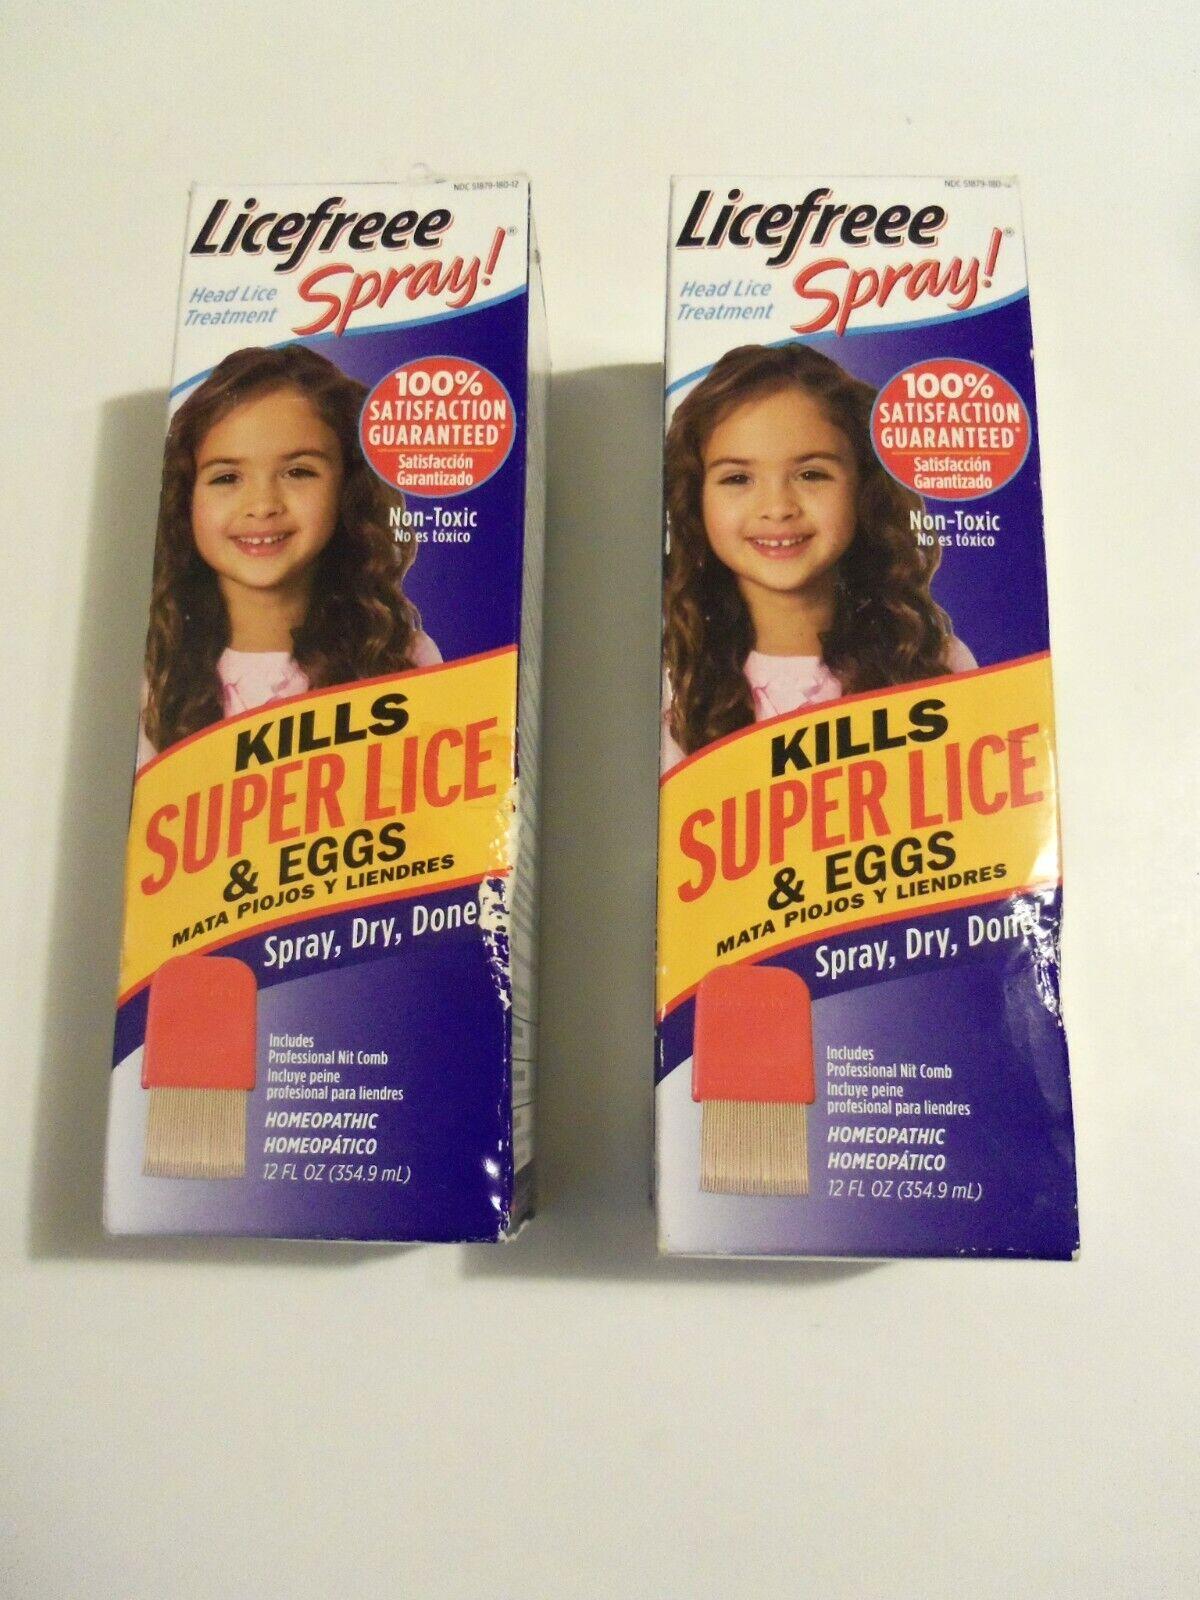 2 Licefreee Spray Head Lice Spray- Super Lice Treatment for